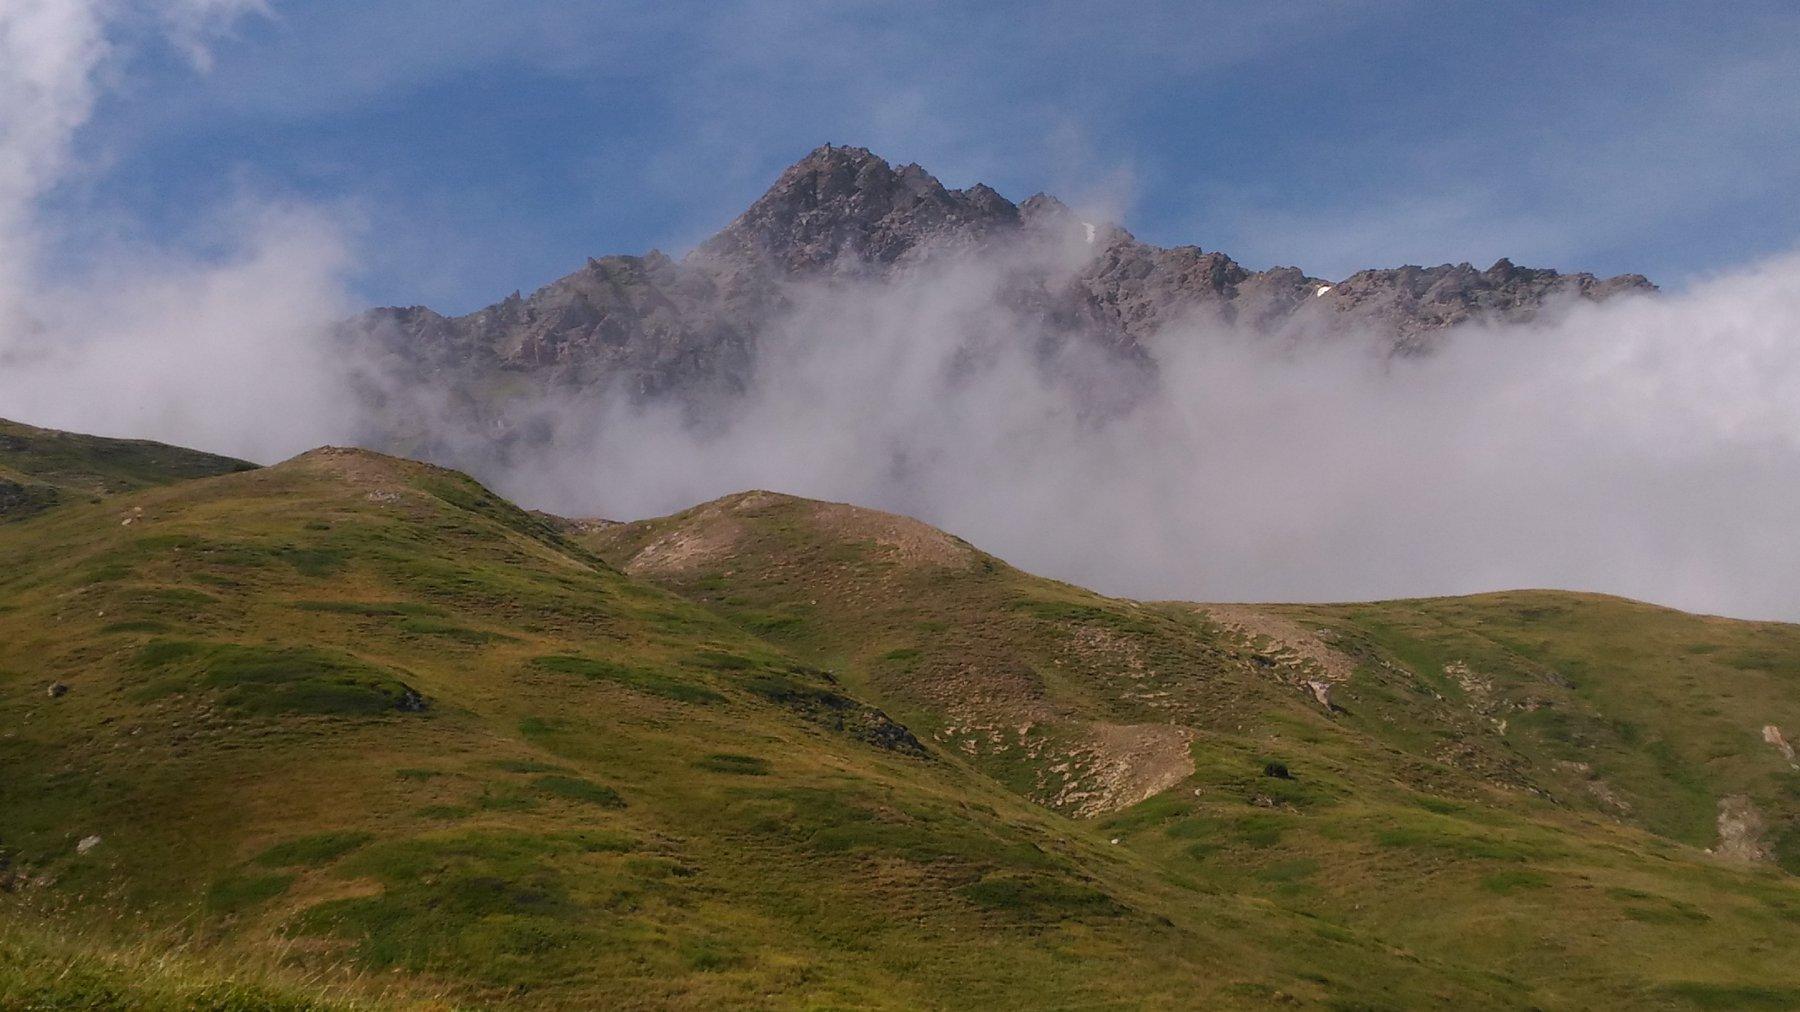 Il Signal visto dai pressi del Refuge du Petit Mont Cenis